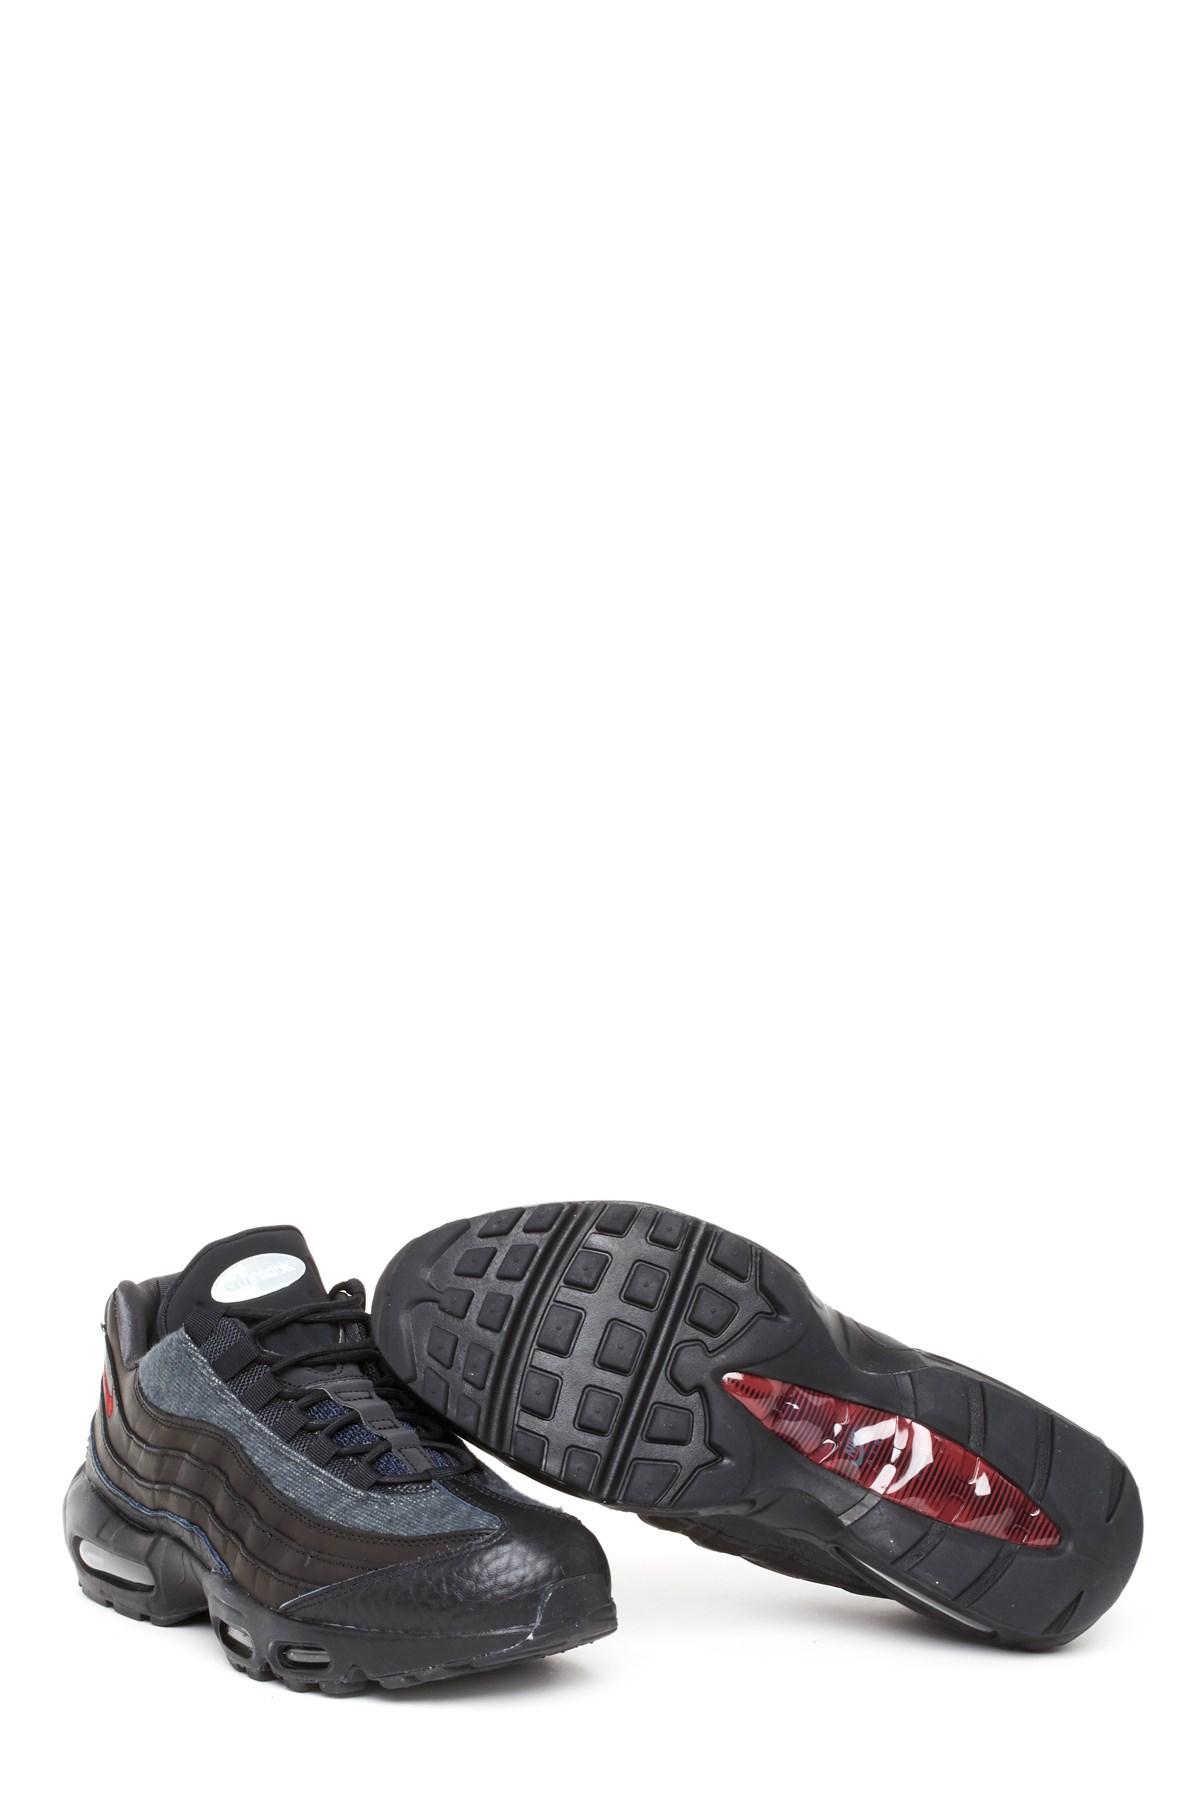 pretty nice 9bb89 53413 Nike.  air max 95 nrg  jacket pack  sneakers